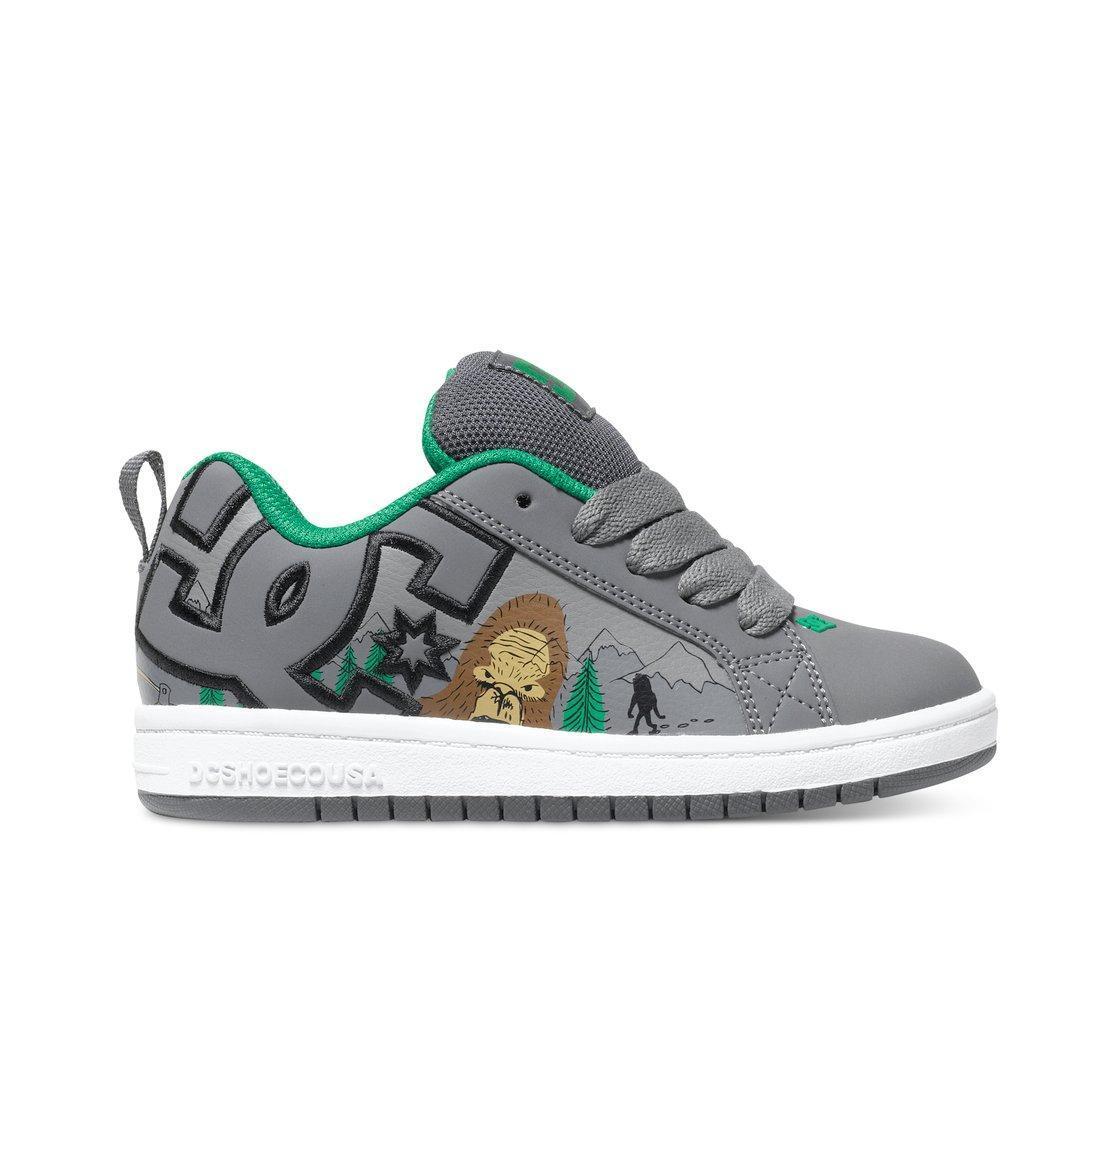 official photos b8712 76a2b DC Shoes Kid Court Graffik - Grigio/Verde